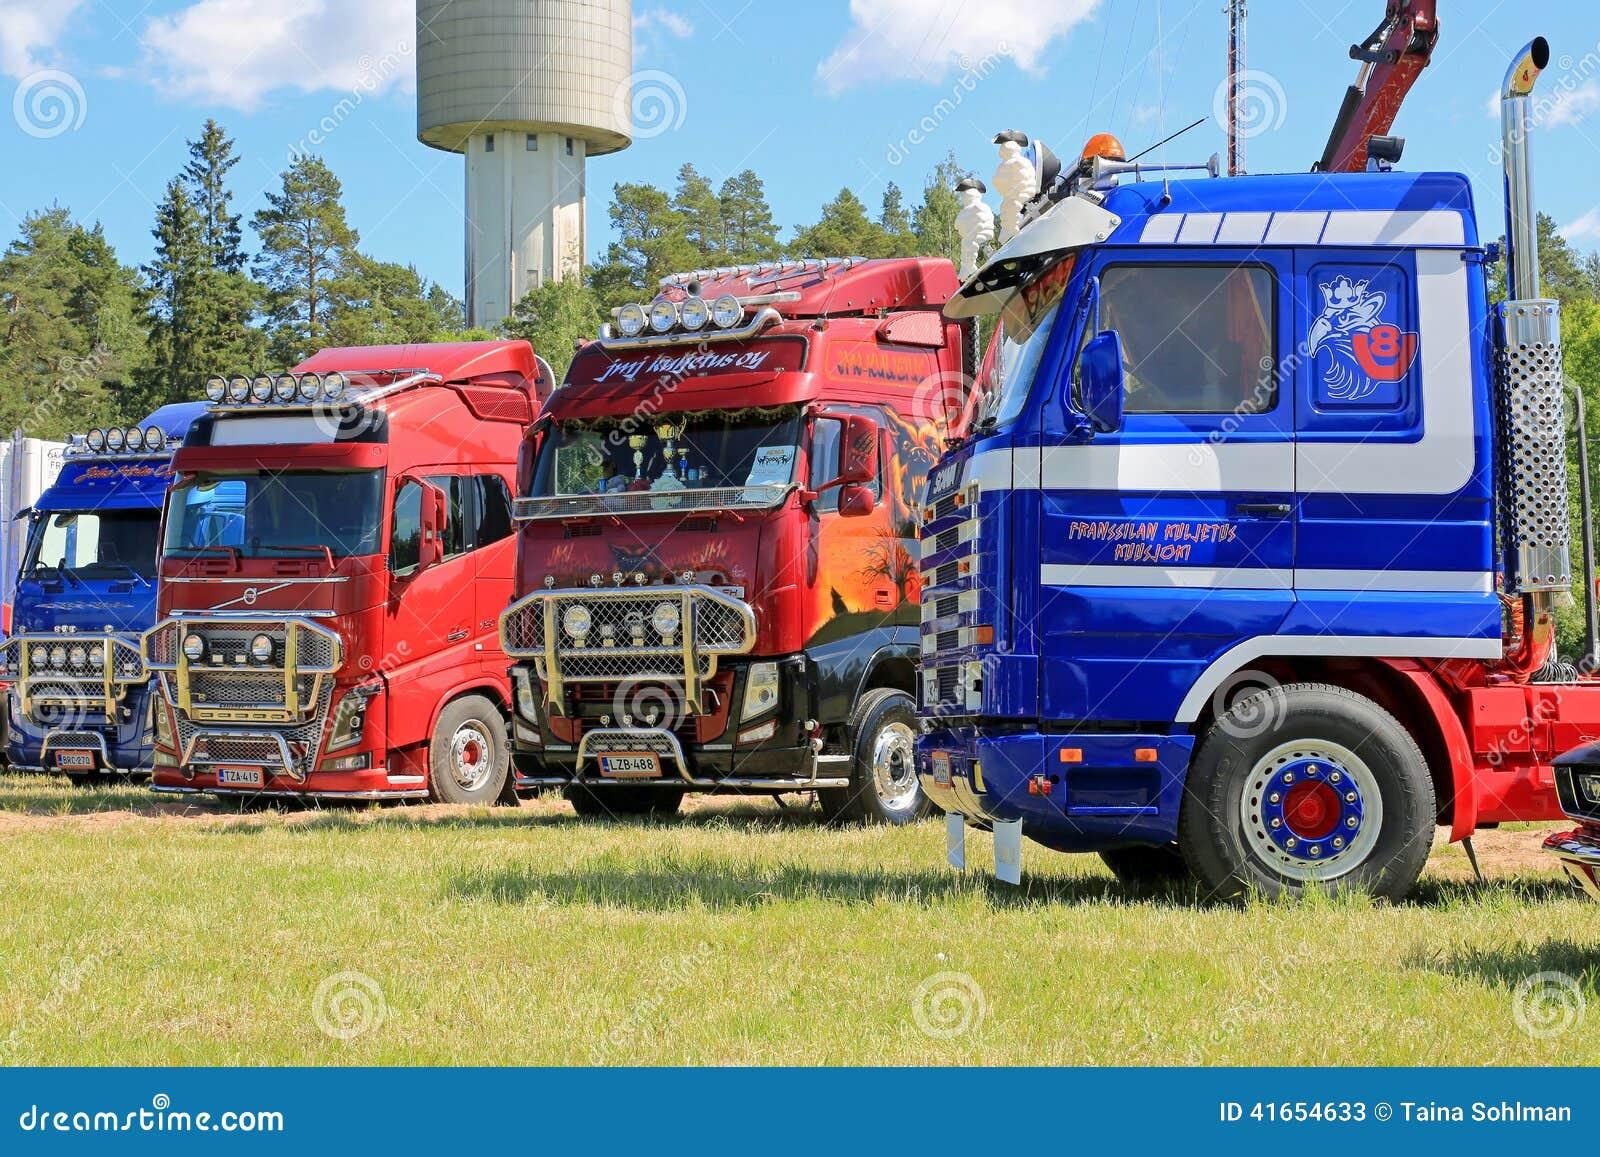 Truck Art At HeMa Show In Loimaa, Finland Editorial Stock Photo - Image: 41654633